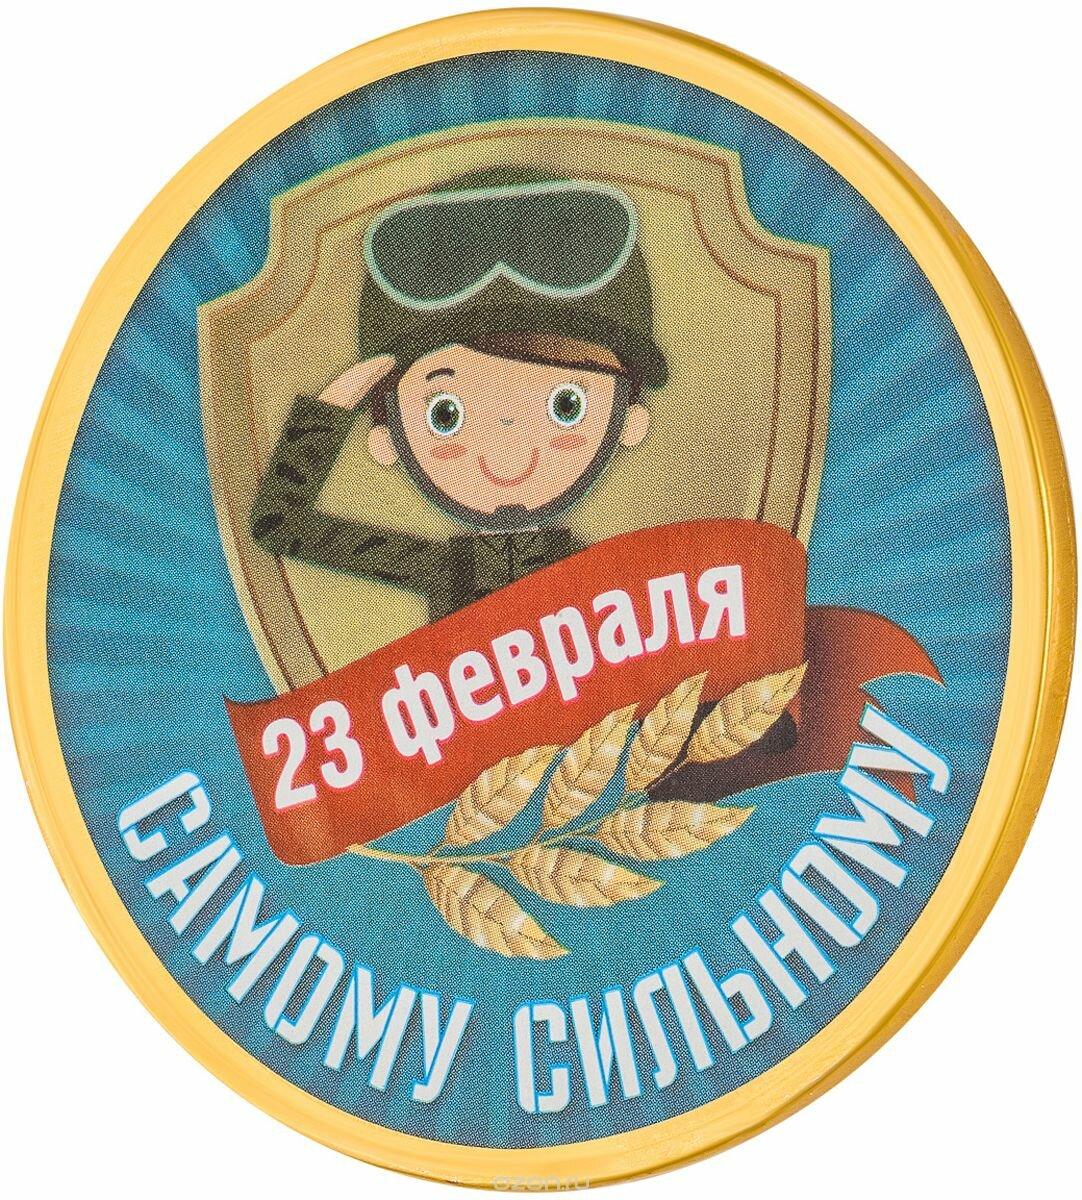 Надписями, картинки 23 февраля медали